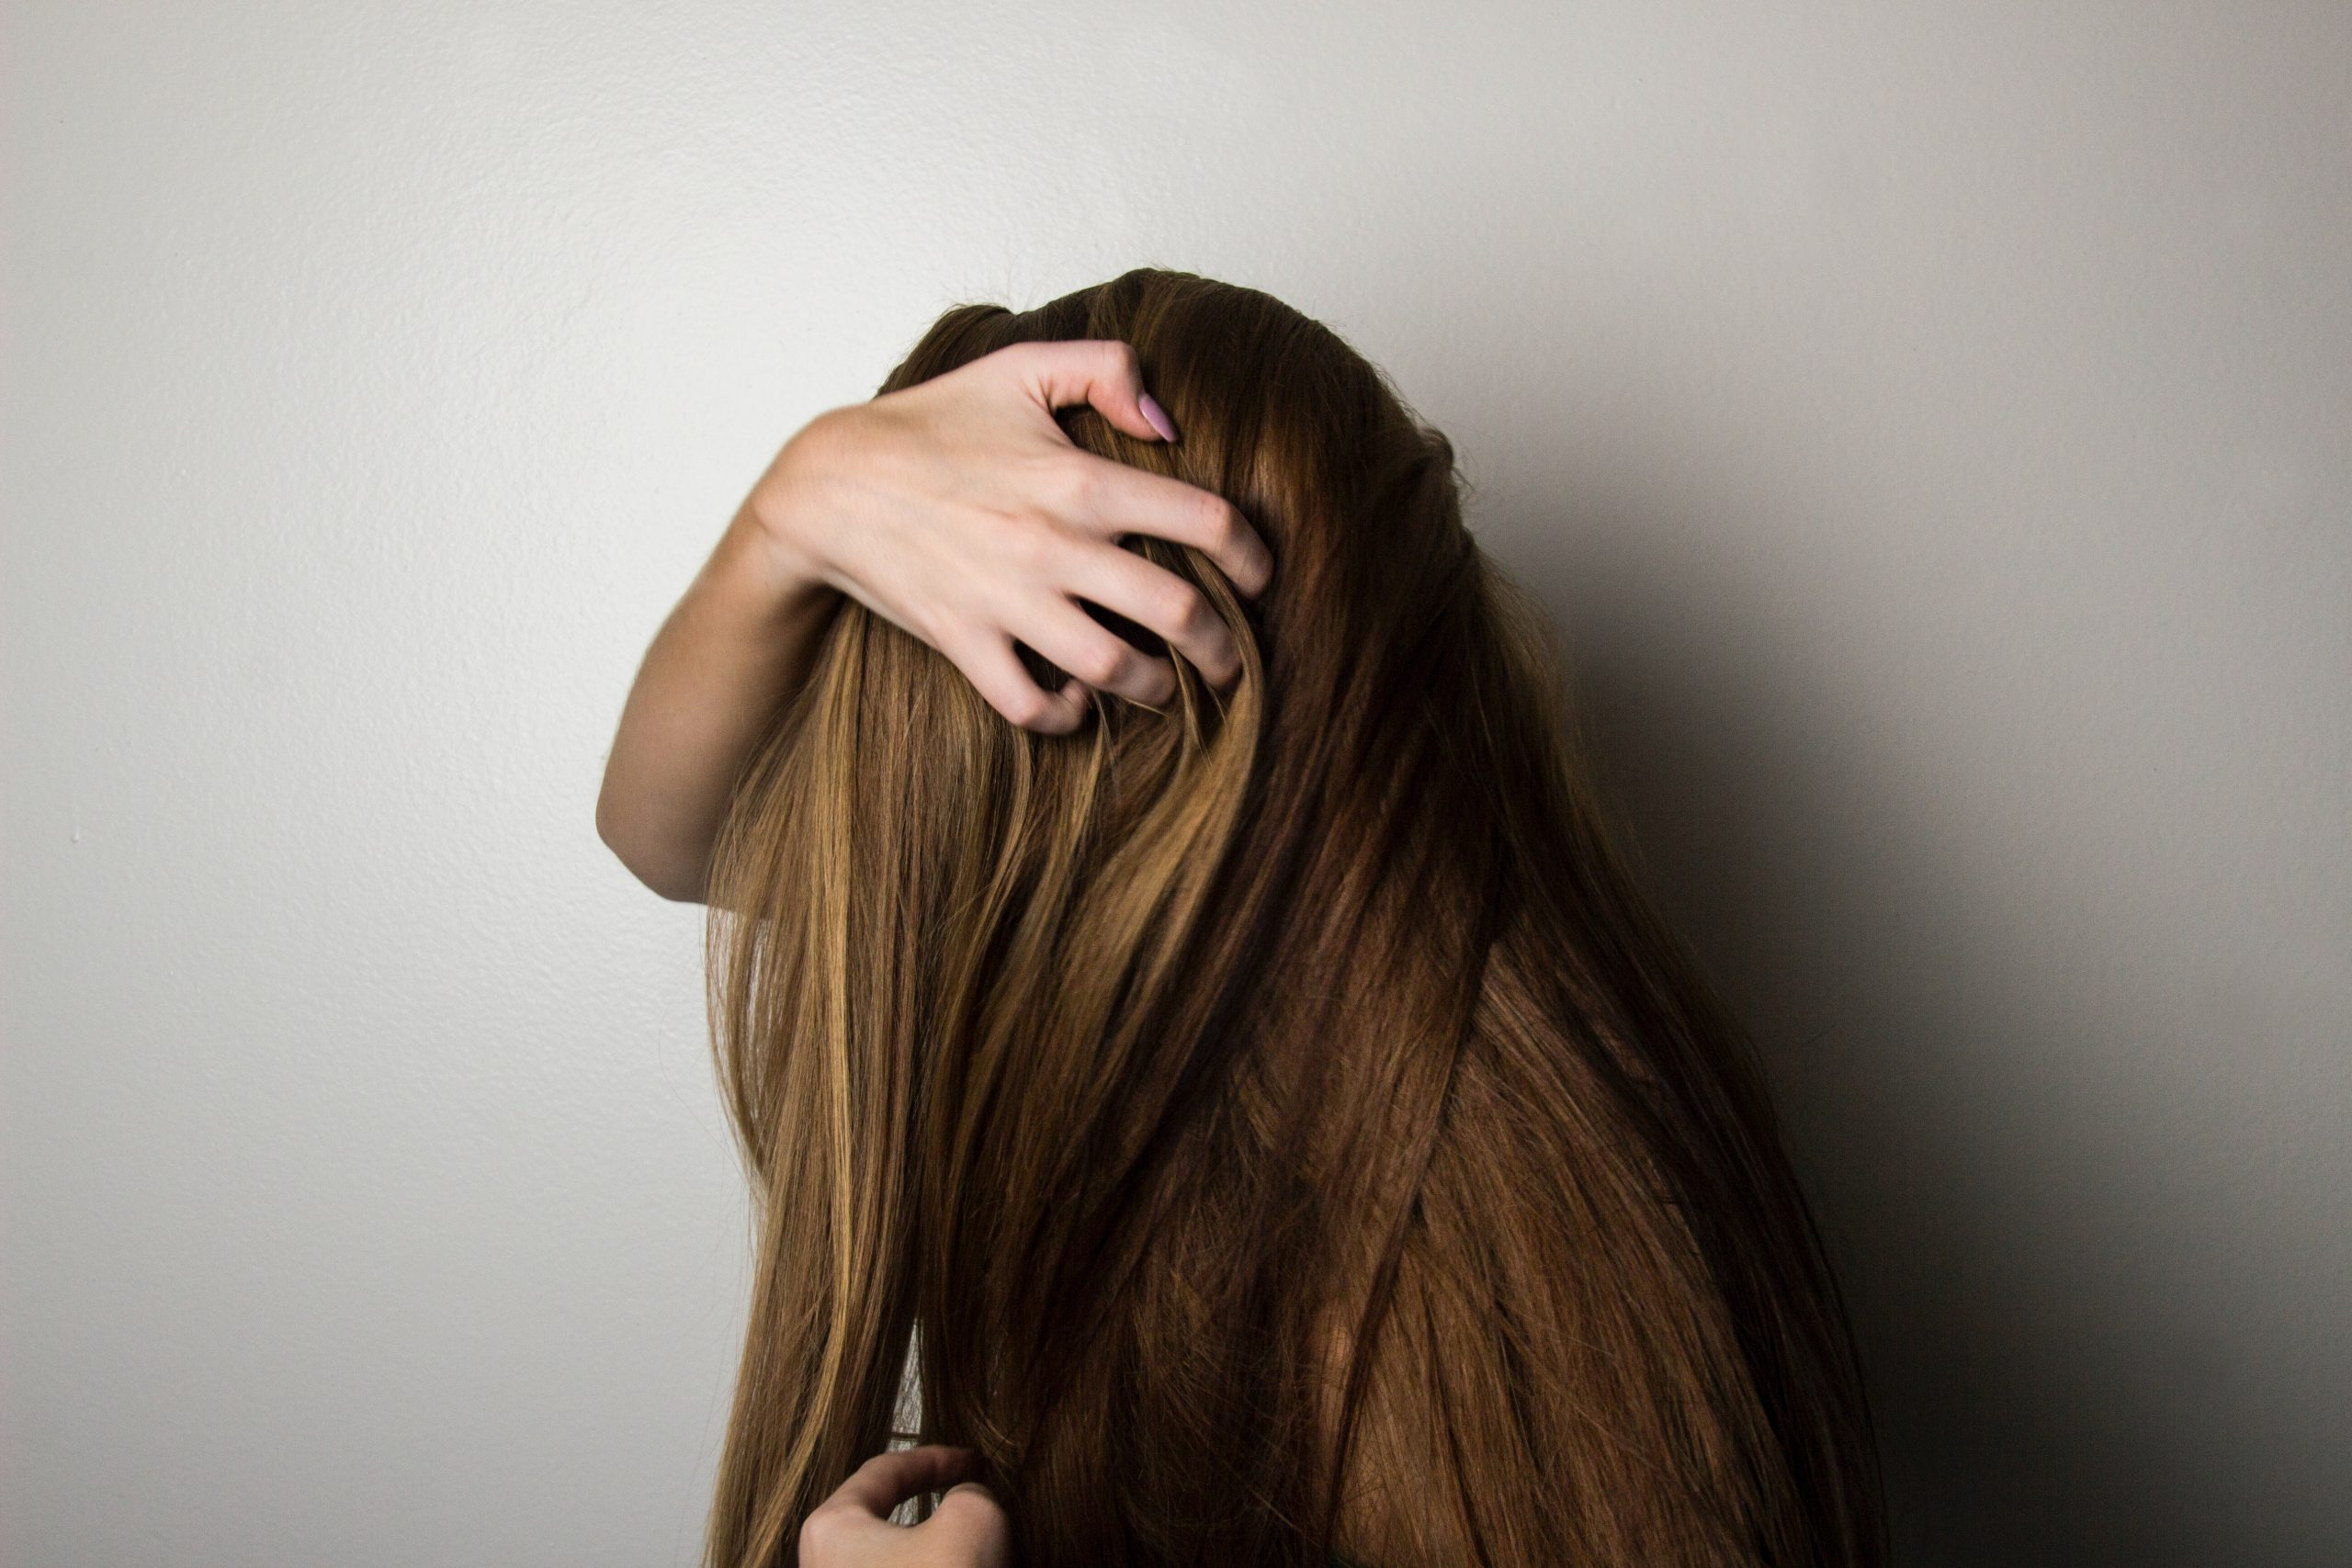 woman running fingers through her hair